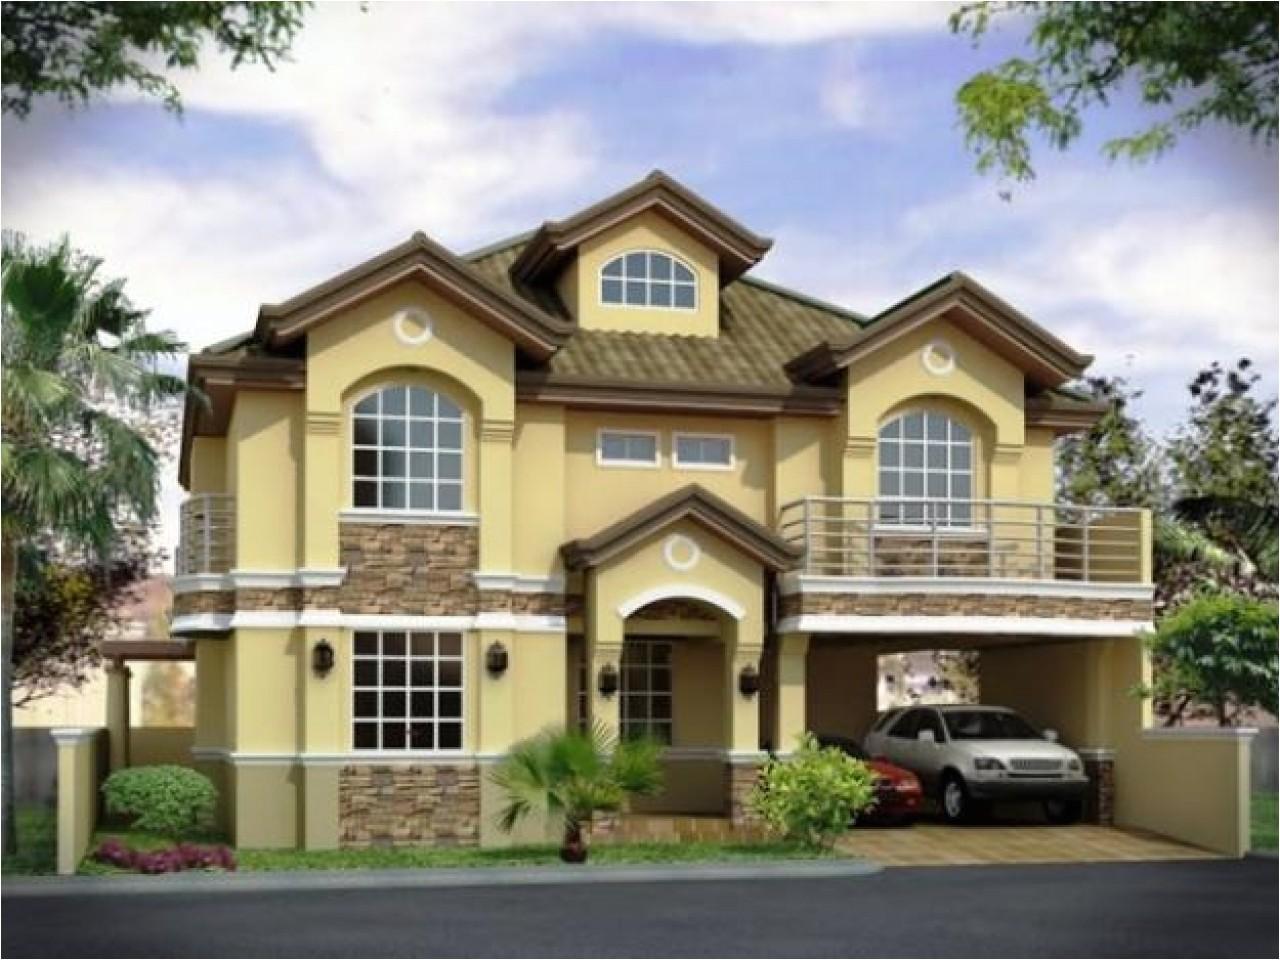 ef9005f06a5530e7 architectural design home house plans architectural designs house plans